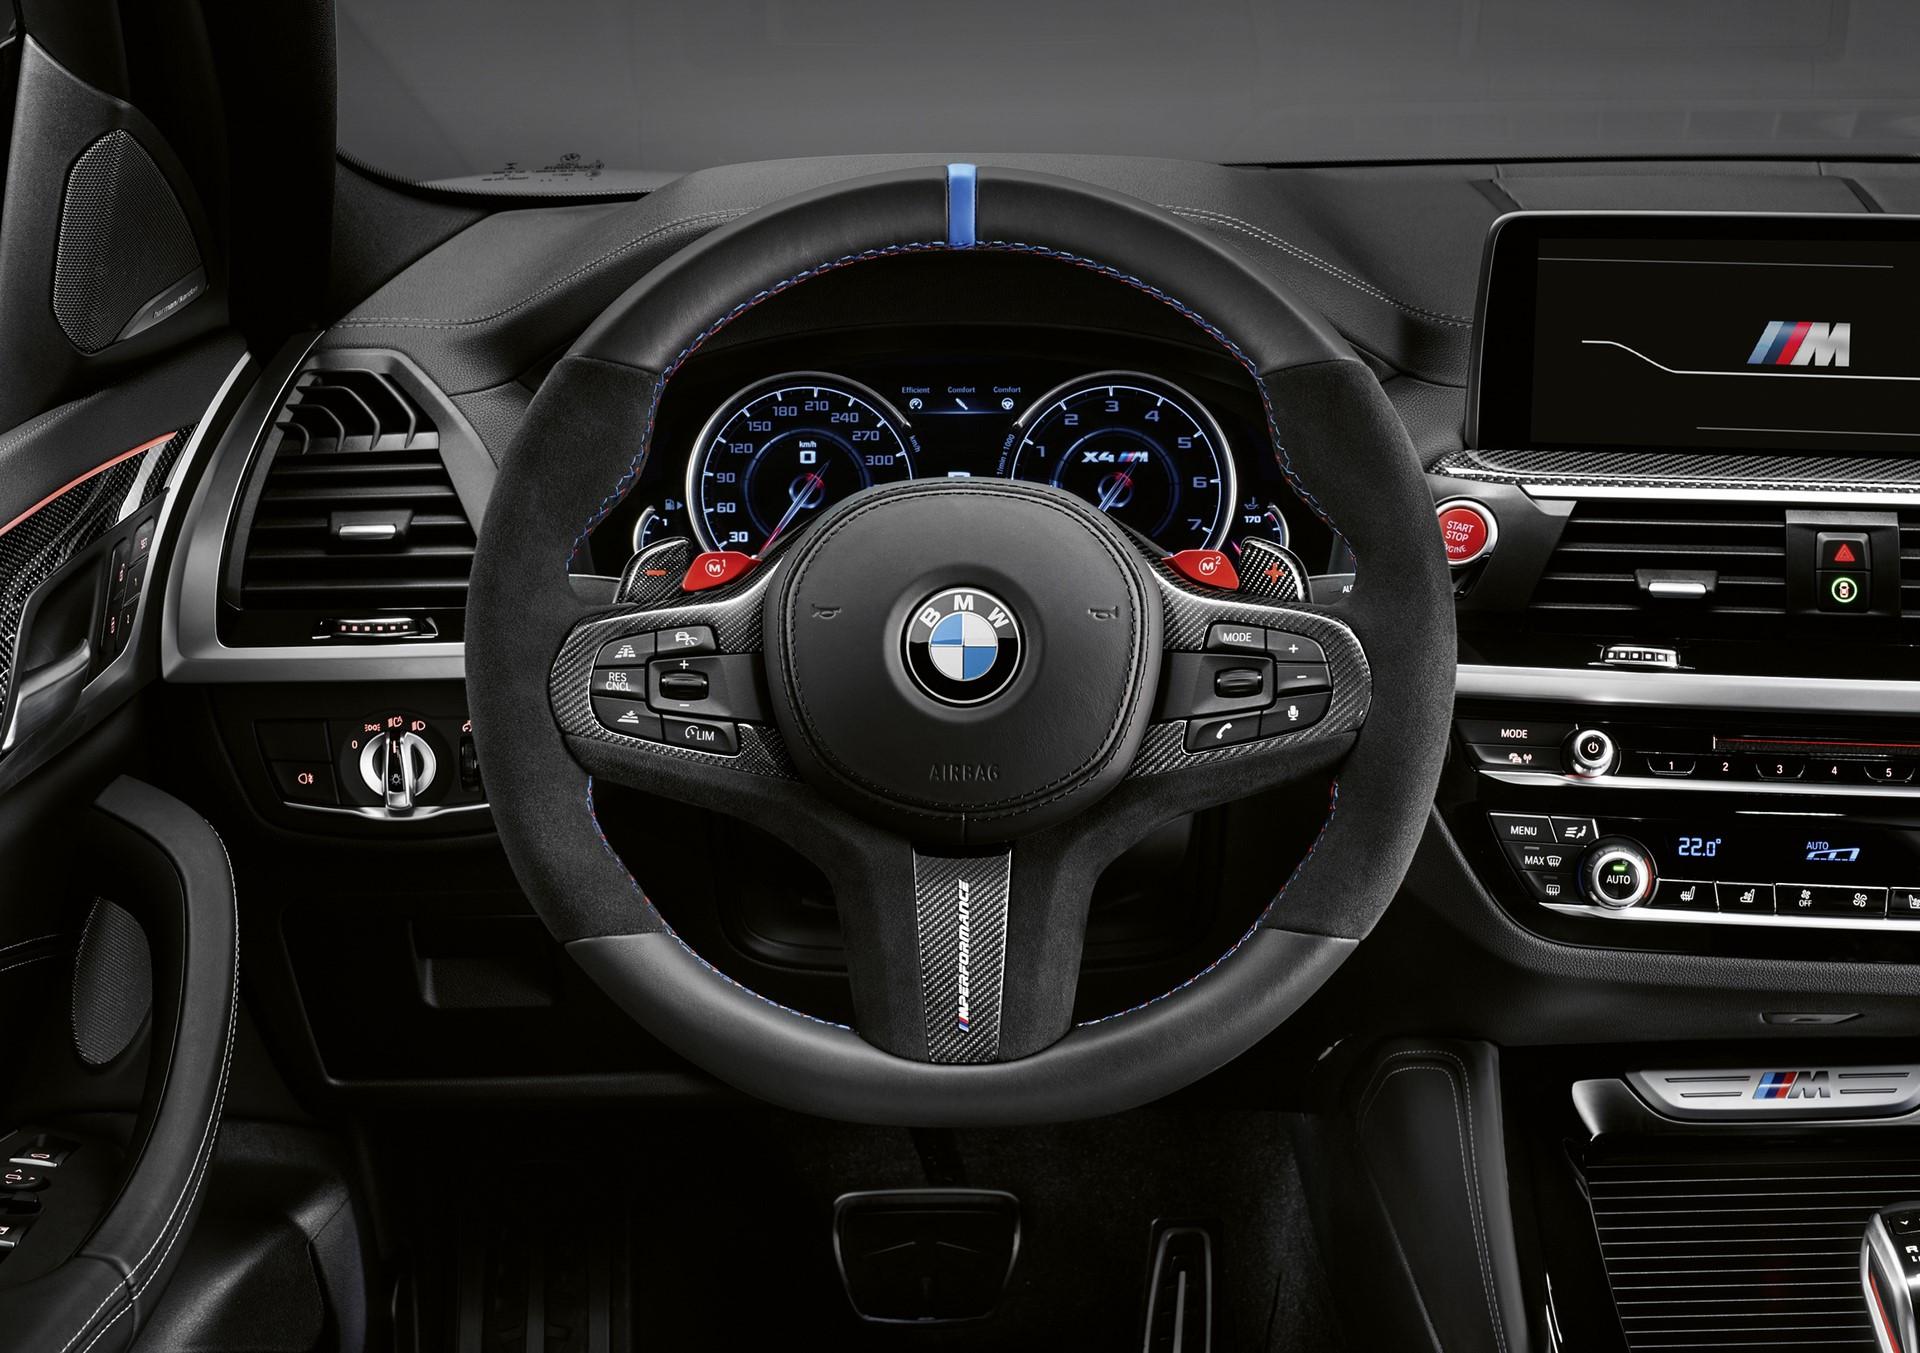 BMW-X3-M-and-BMW-X4-M-M-Performance-Parts-11